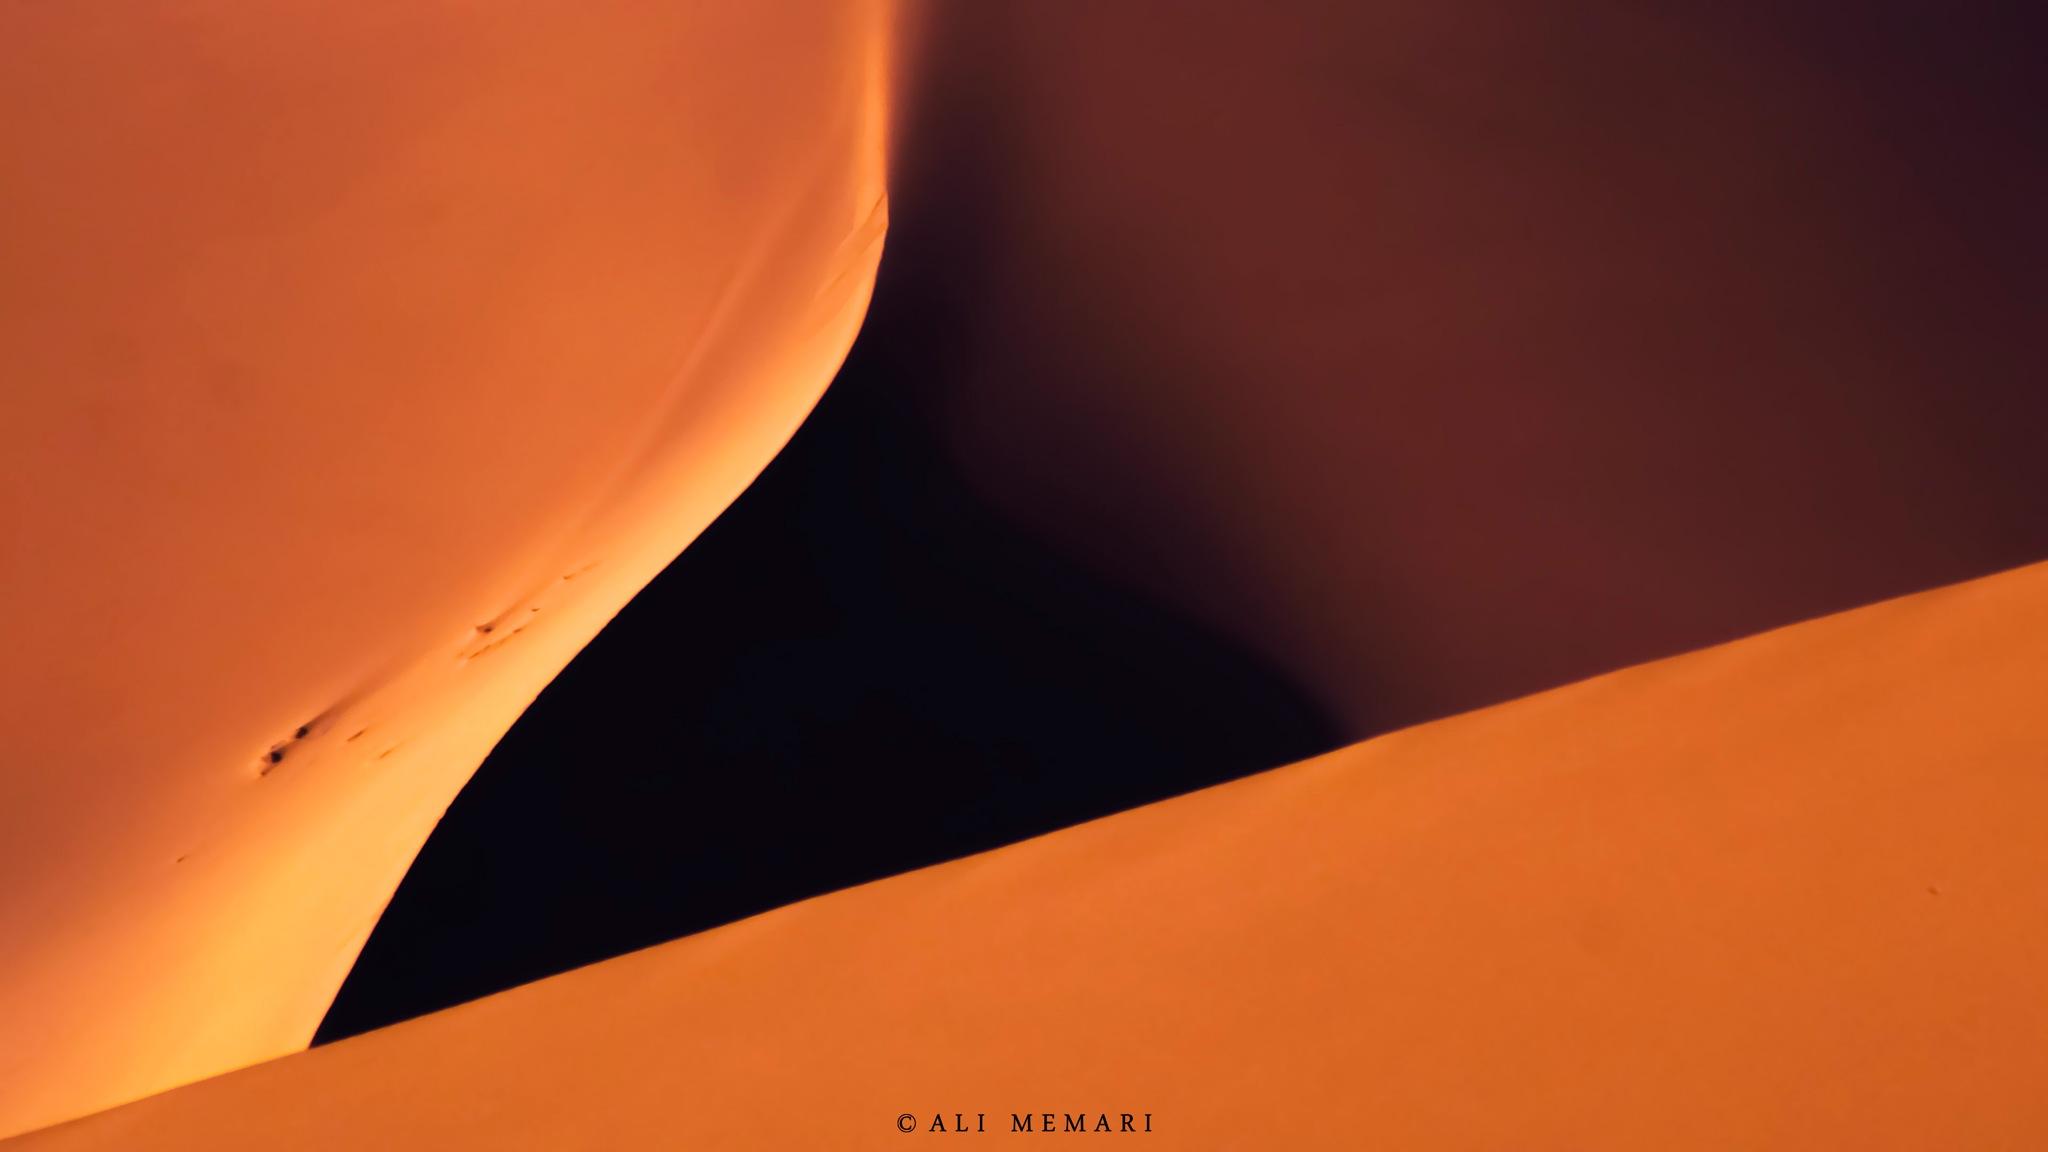 Untitled by Ali Memari